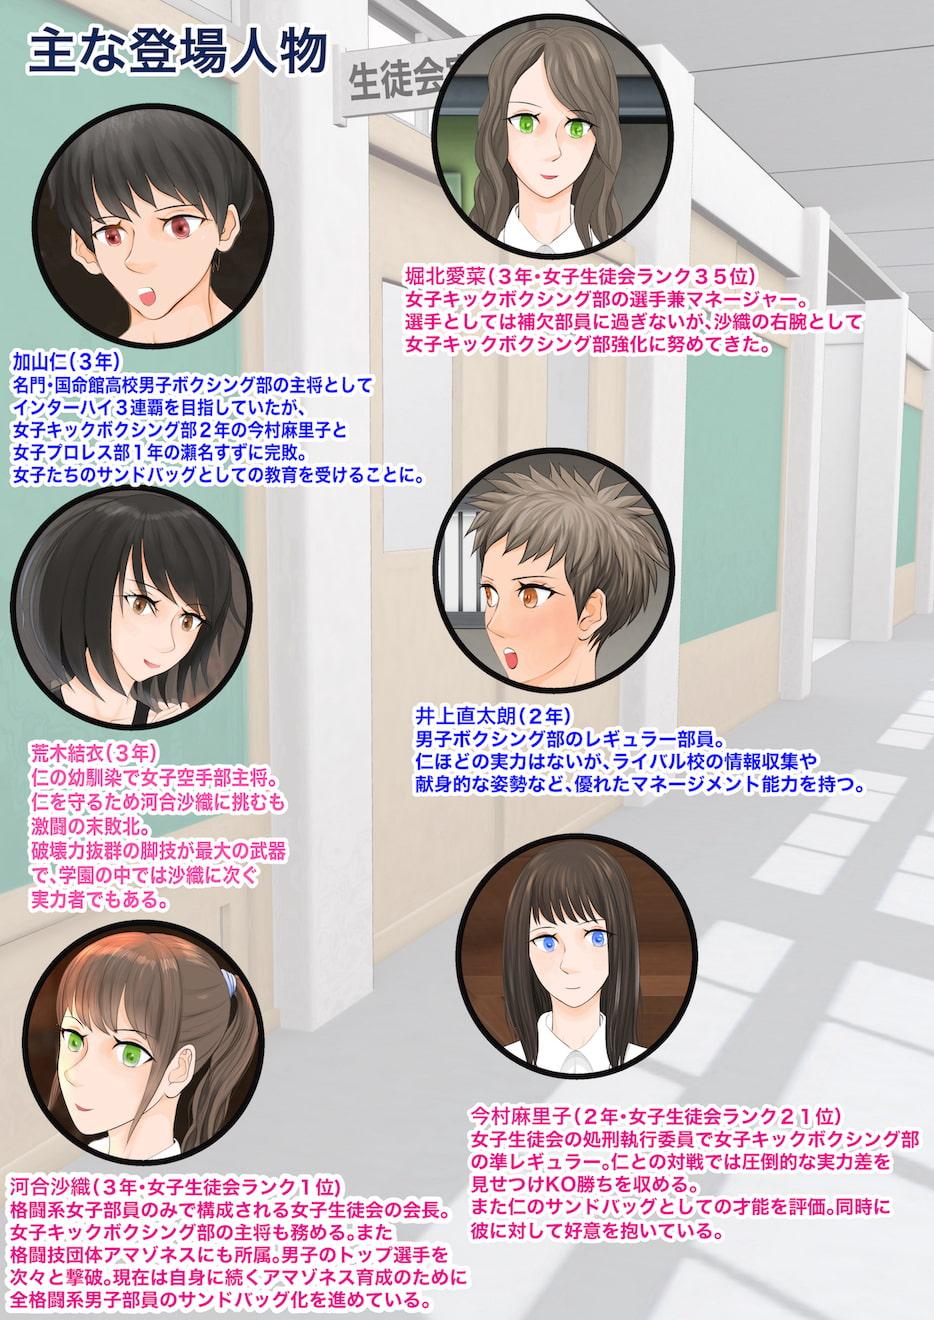 RJ333388 女子生徒会との闘い3〜屈辱のハンディキャップマッチ打ち砕かれた三つの星〜 [20210725]